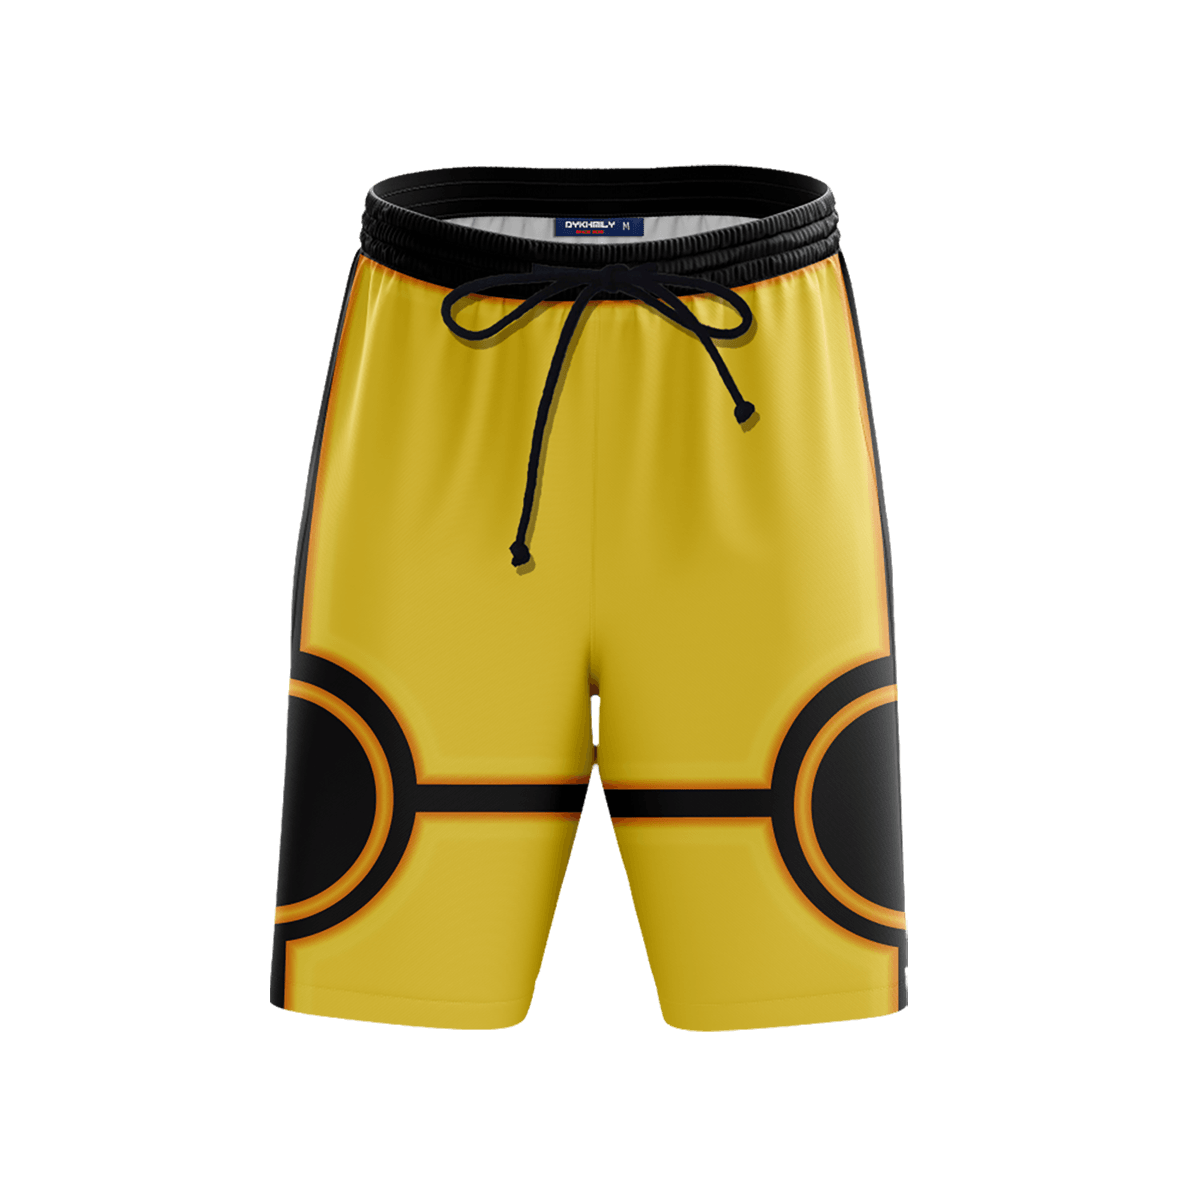 Nine-Tails Chakra Beach Shorts FDM3107 S Official Anime Swimsuit Merch